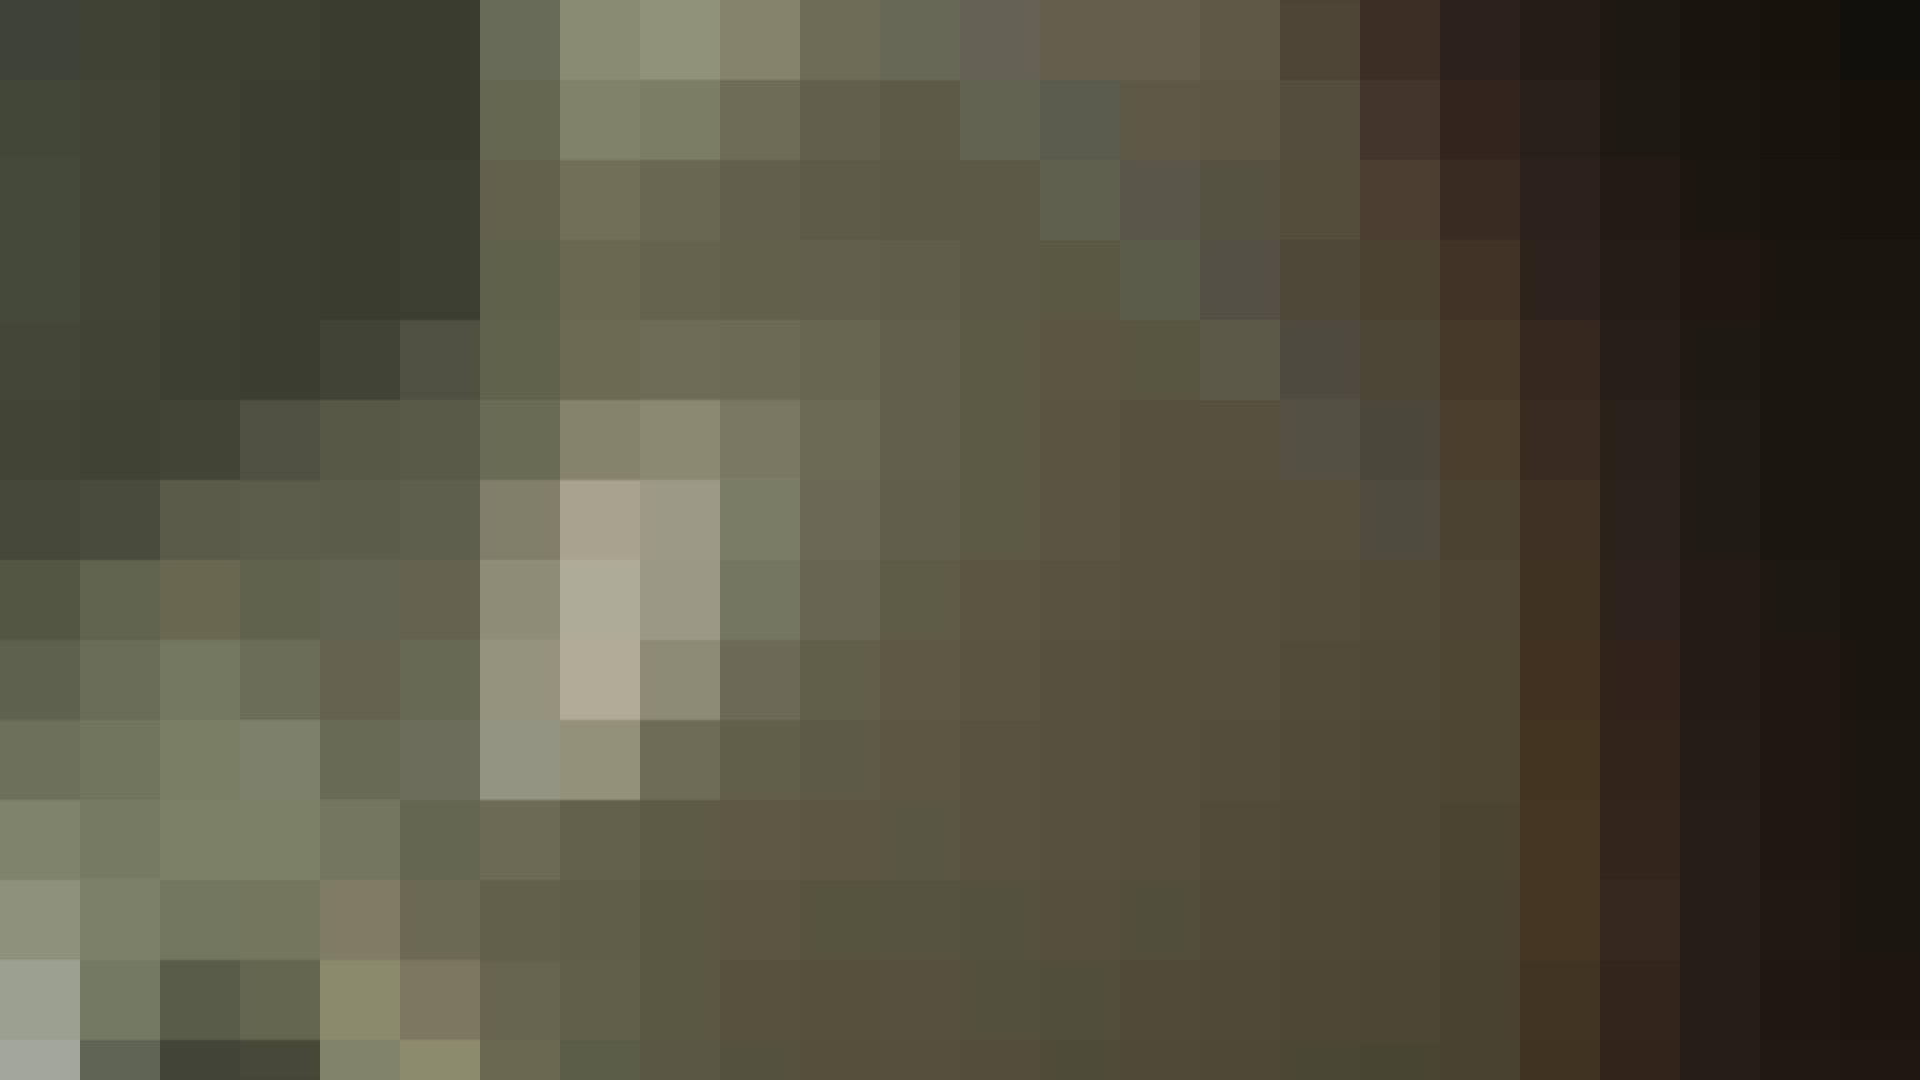 vol.25三十時間潜り、一つしか出会えない完璧桃尻編 byお銀 洗面所 のぞき動画キャプチャ 96連発 63